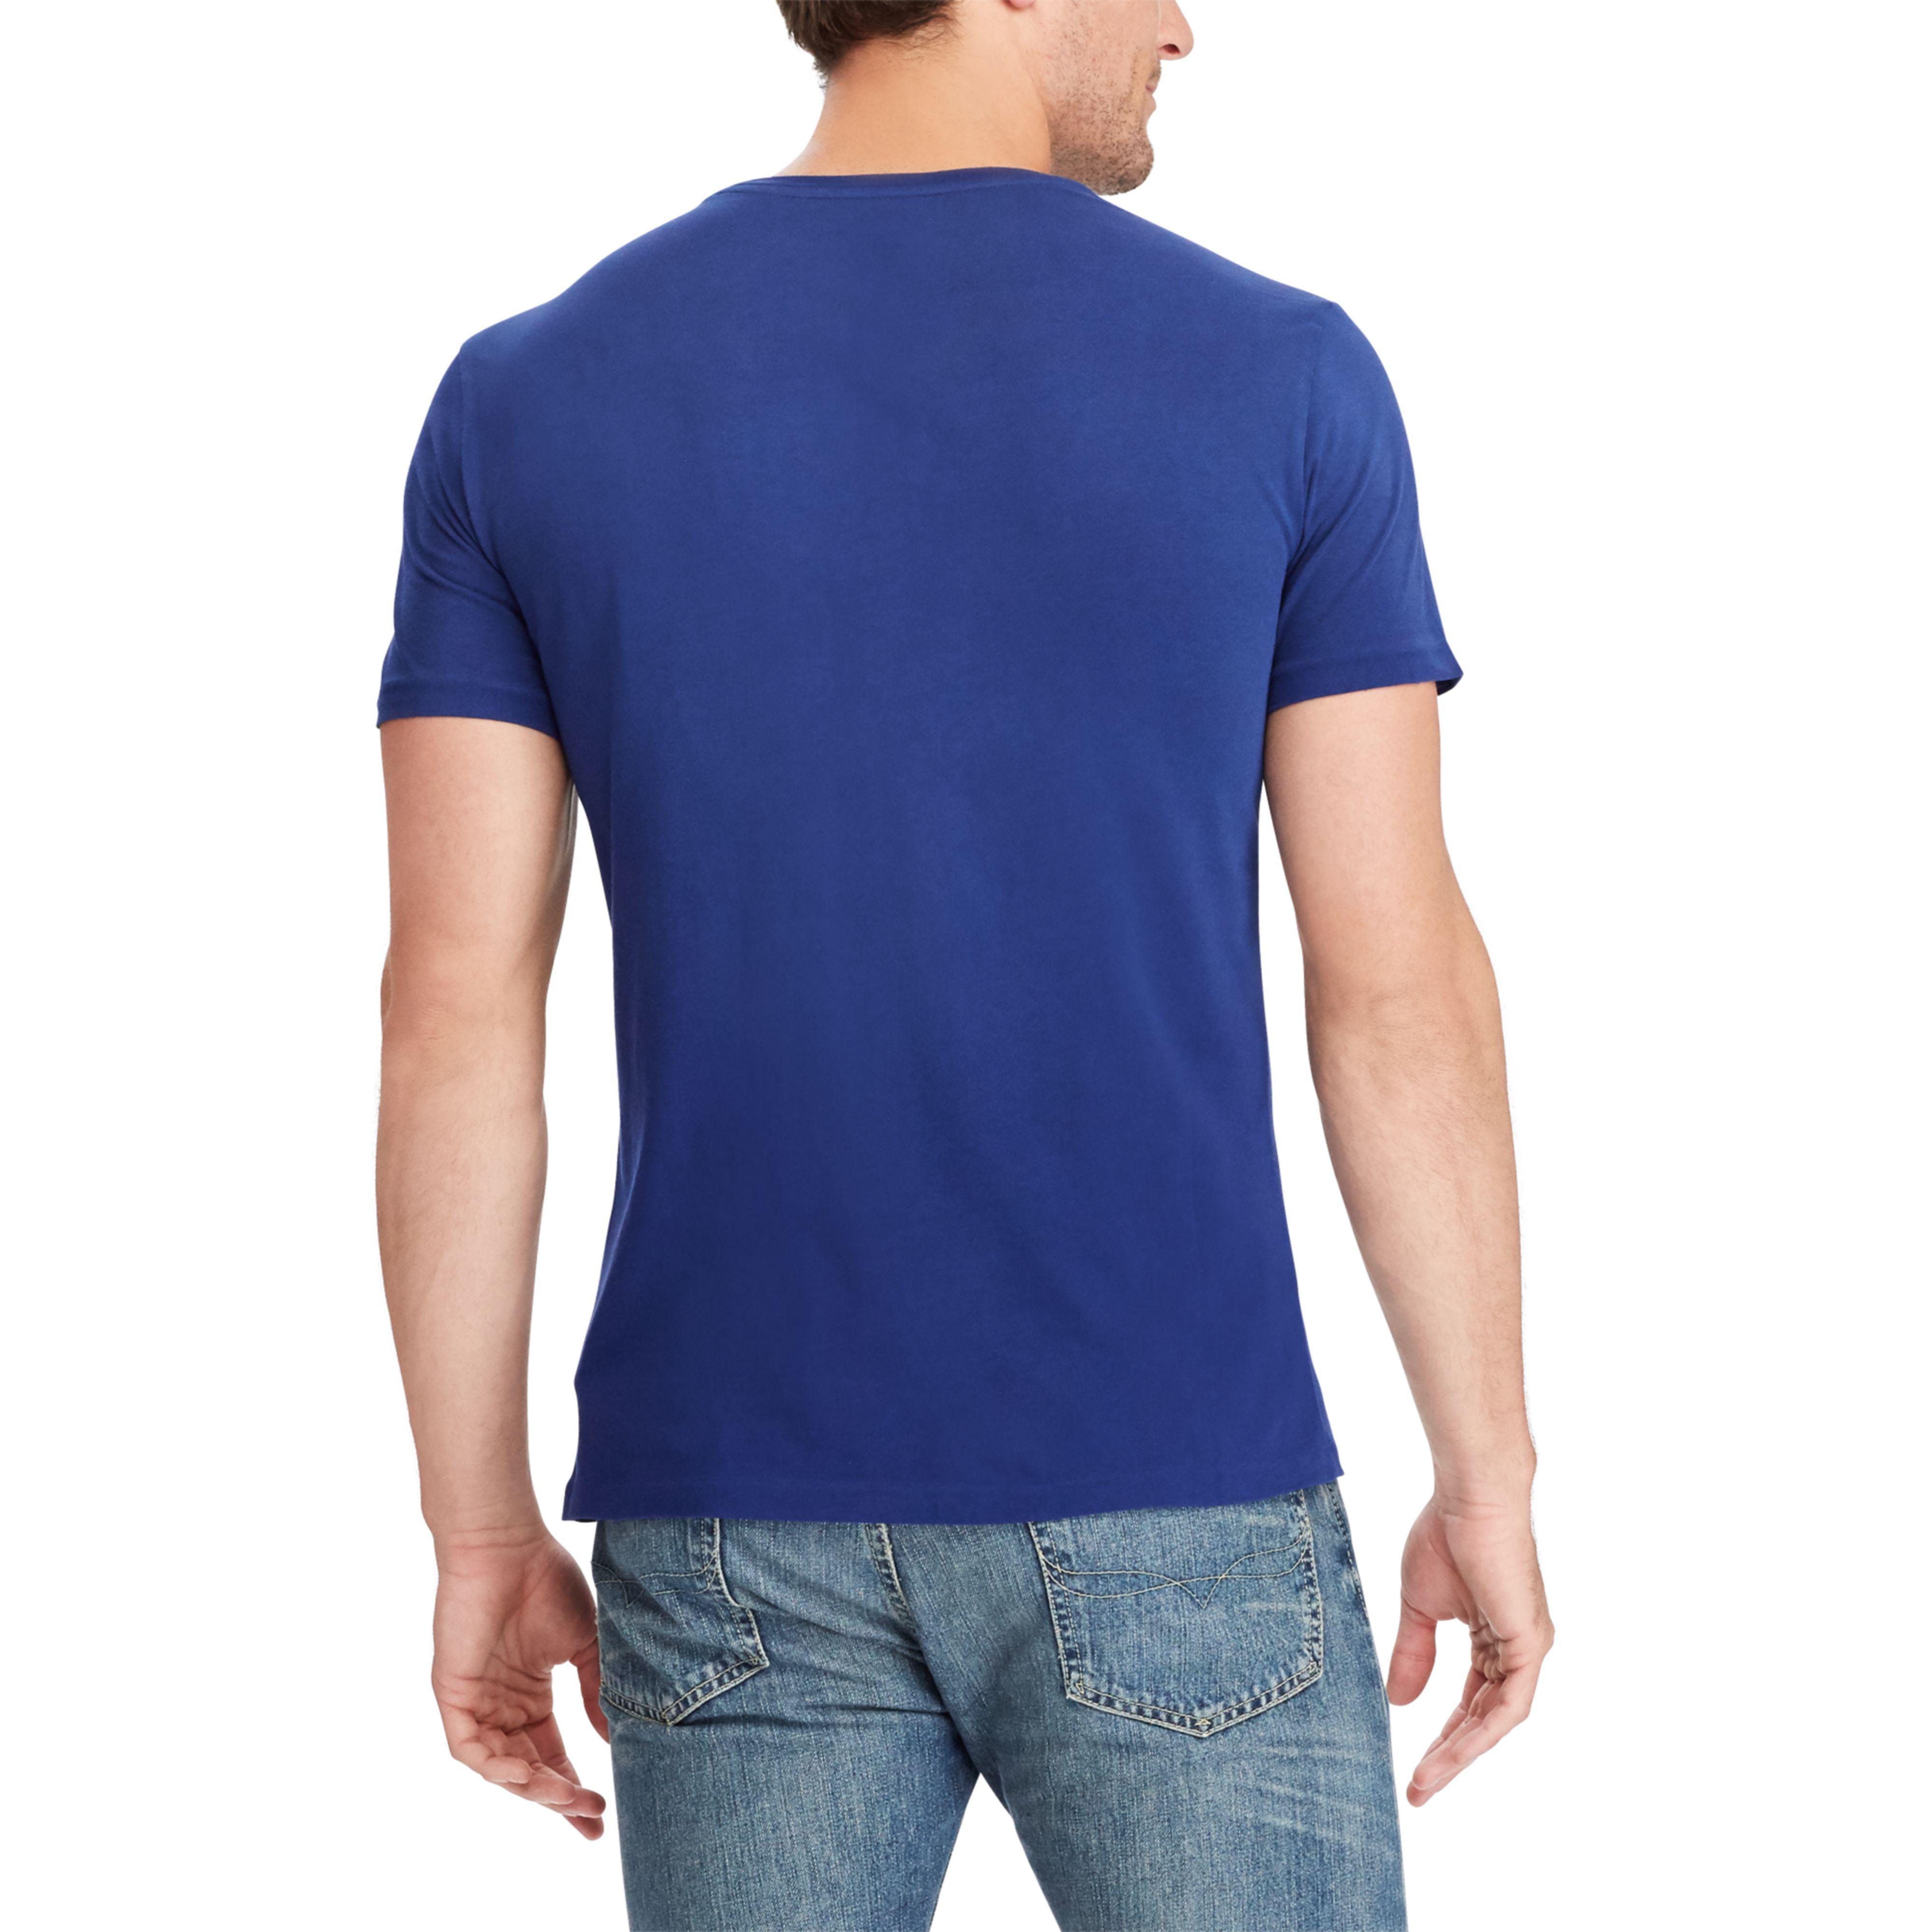 87c9892a3 Lyst - Polo Ralph Lauren Custom Slim Fit Cotton T-shirt in Blue for Men